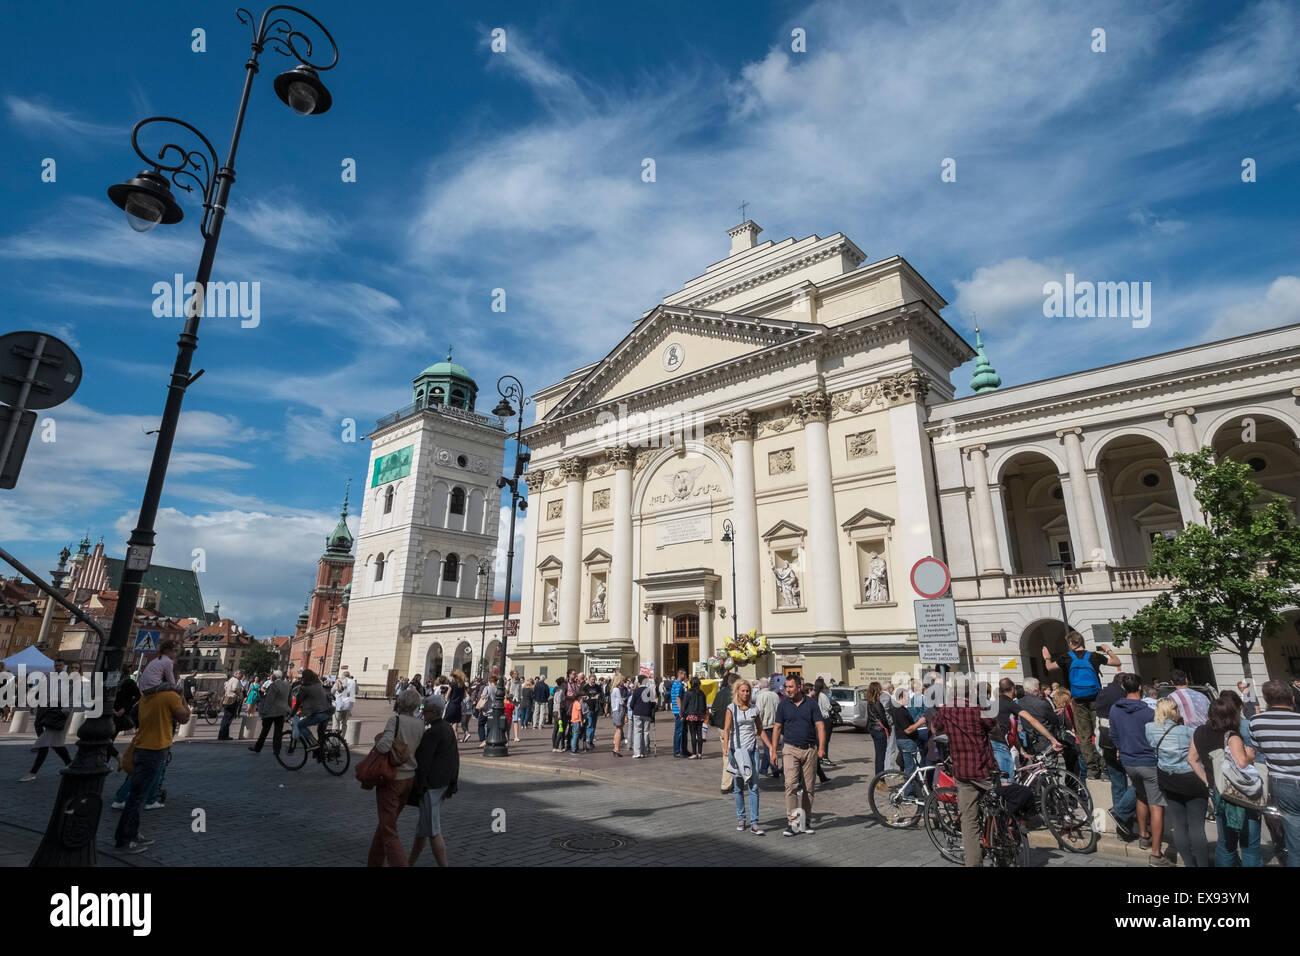 Los turistas que caminan en la calle Krakowskie Przedmiescie, cerca de St Annes iglesia, Varsovia, Polonia Imagen De Stock